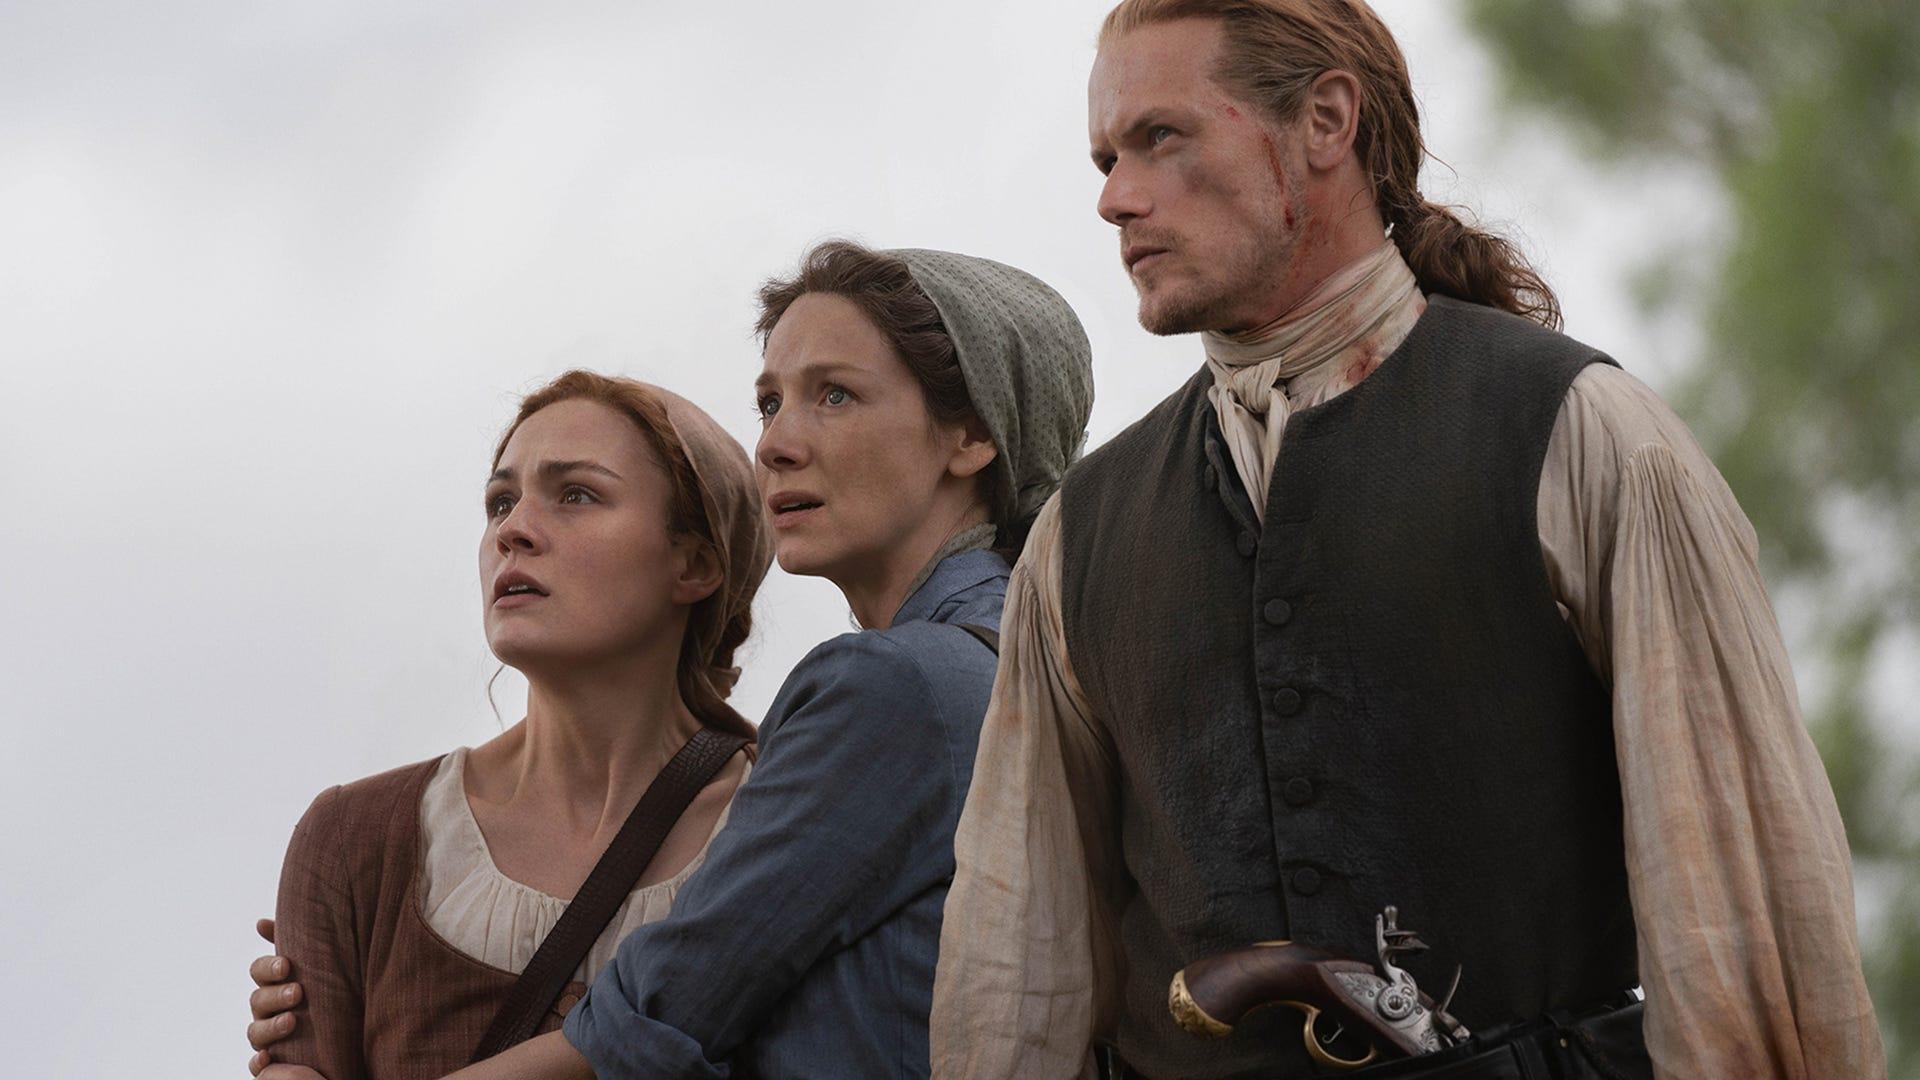 Sophie Skelton, Caitriona Balfe and Sam Heughan, Outlander